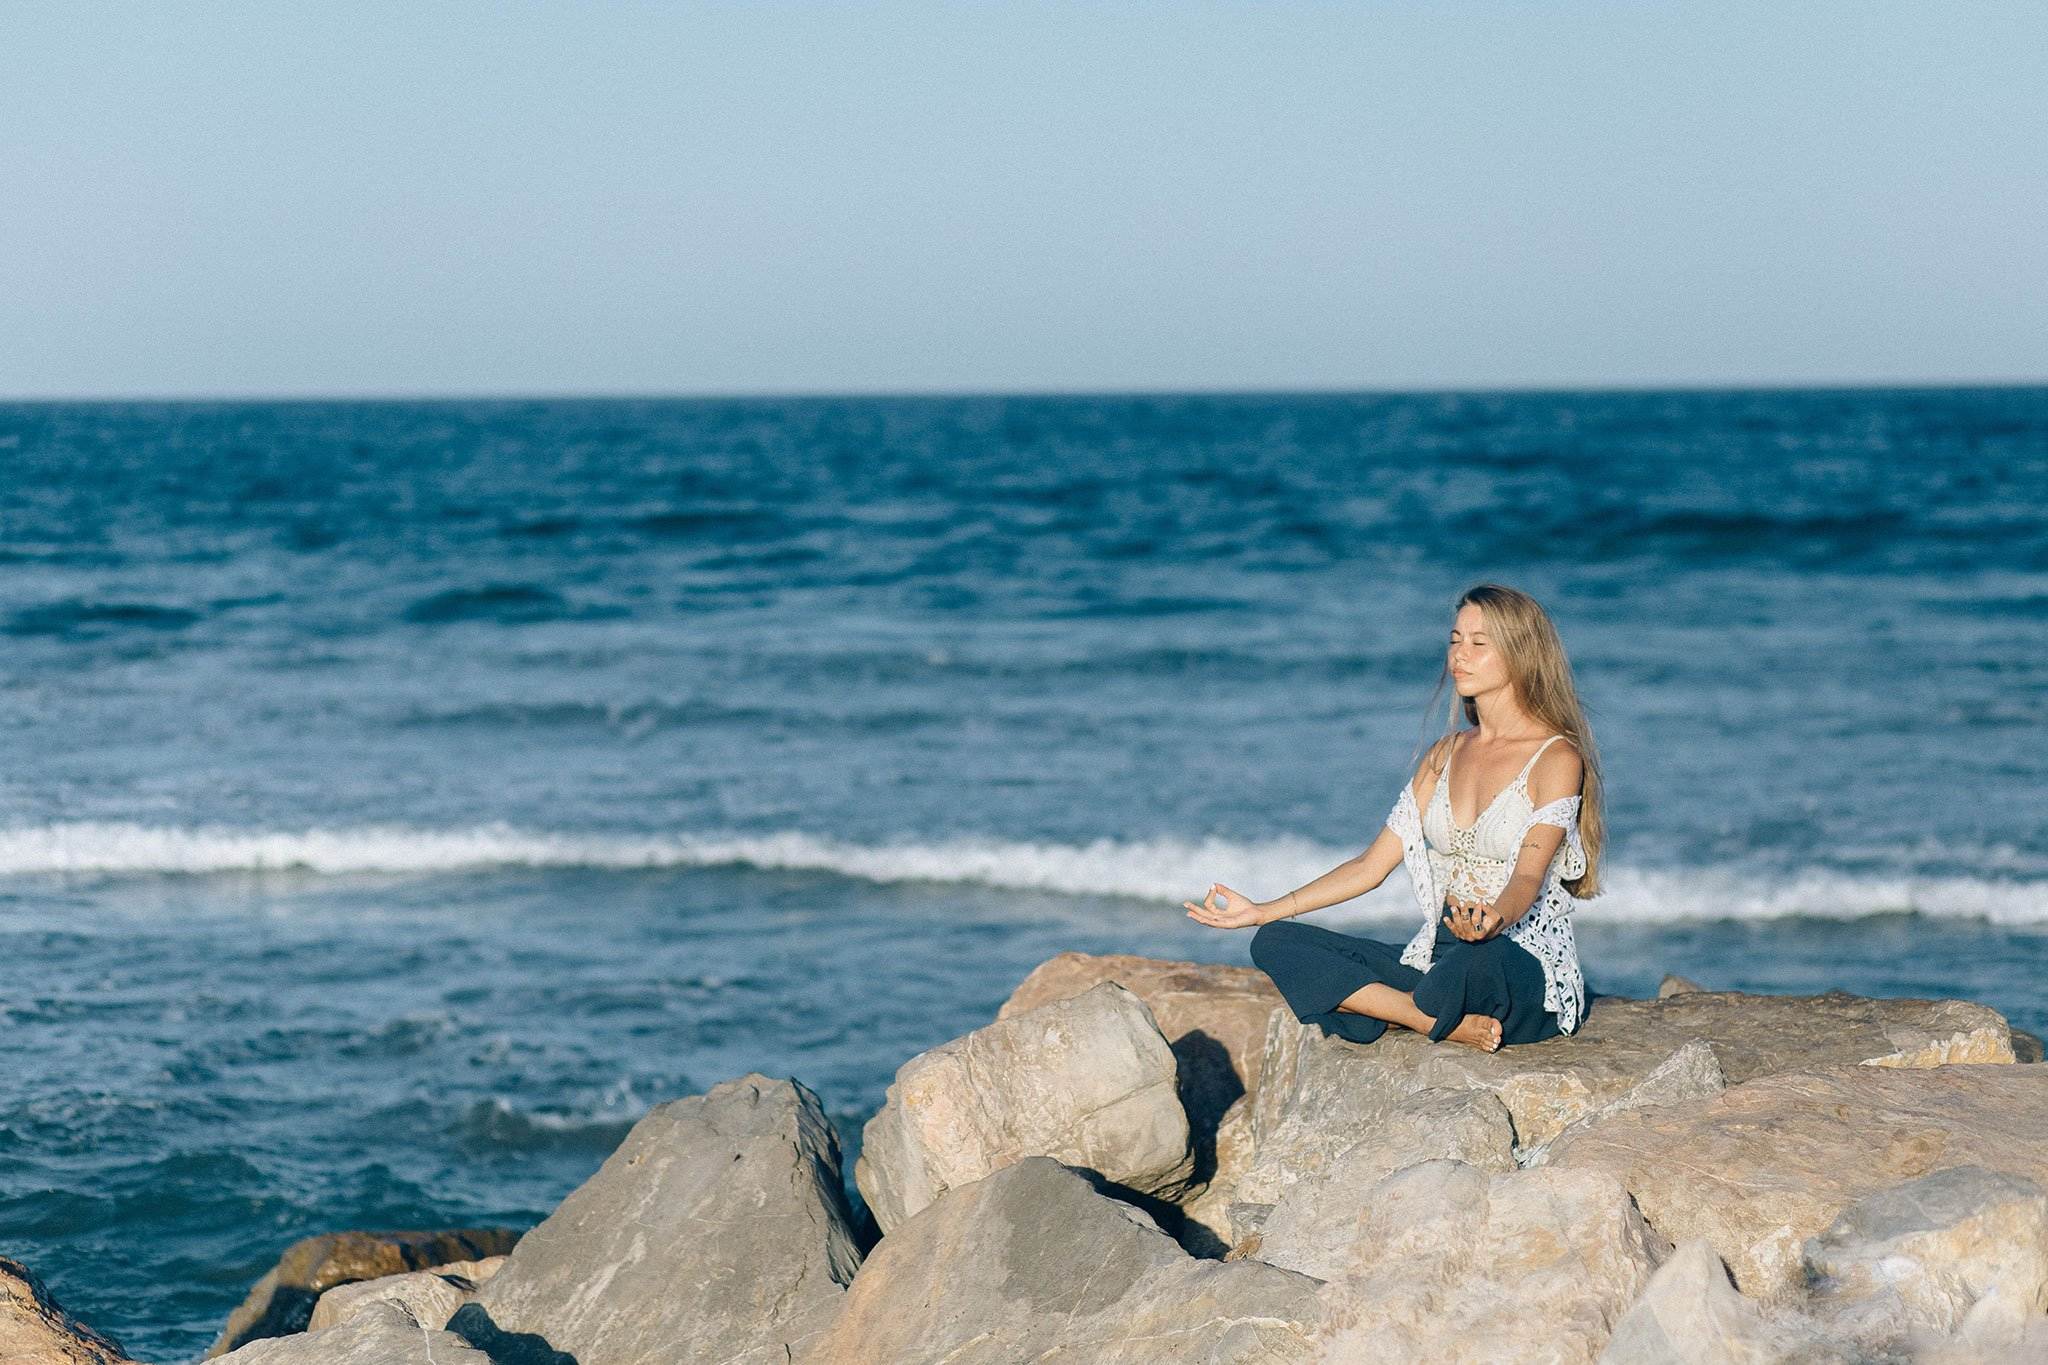 Gemi Bertran's Blog: NEW Opportunity in Your Future With Nourish the Brain Institute